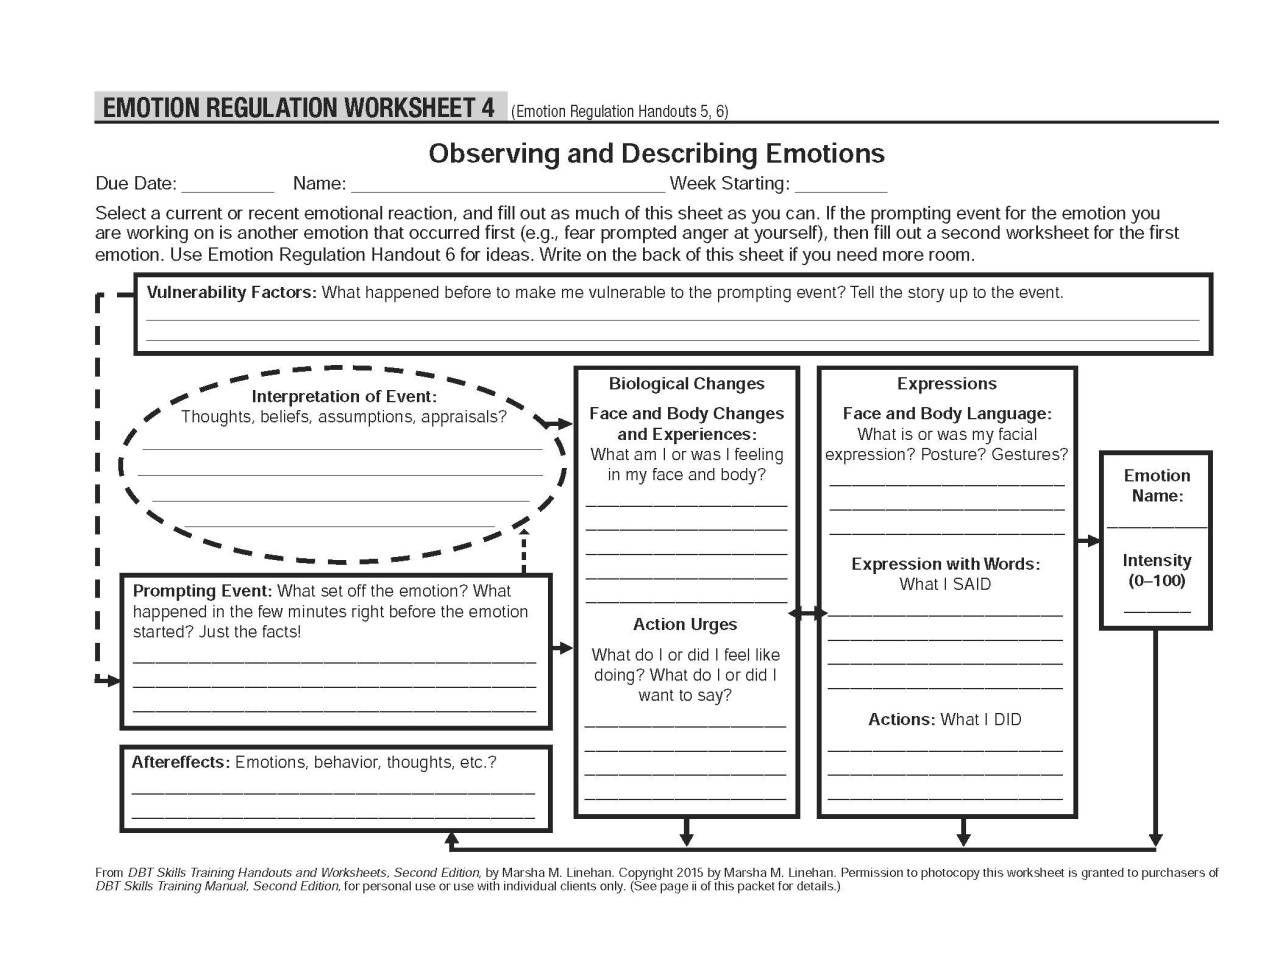 Worksheets Emotional Regulation Worksheets dbt self help resources observing and describing emotions these worksheets accompany the emotion regulation handout 6 also look a